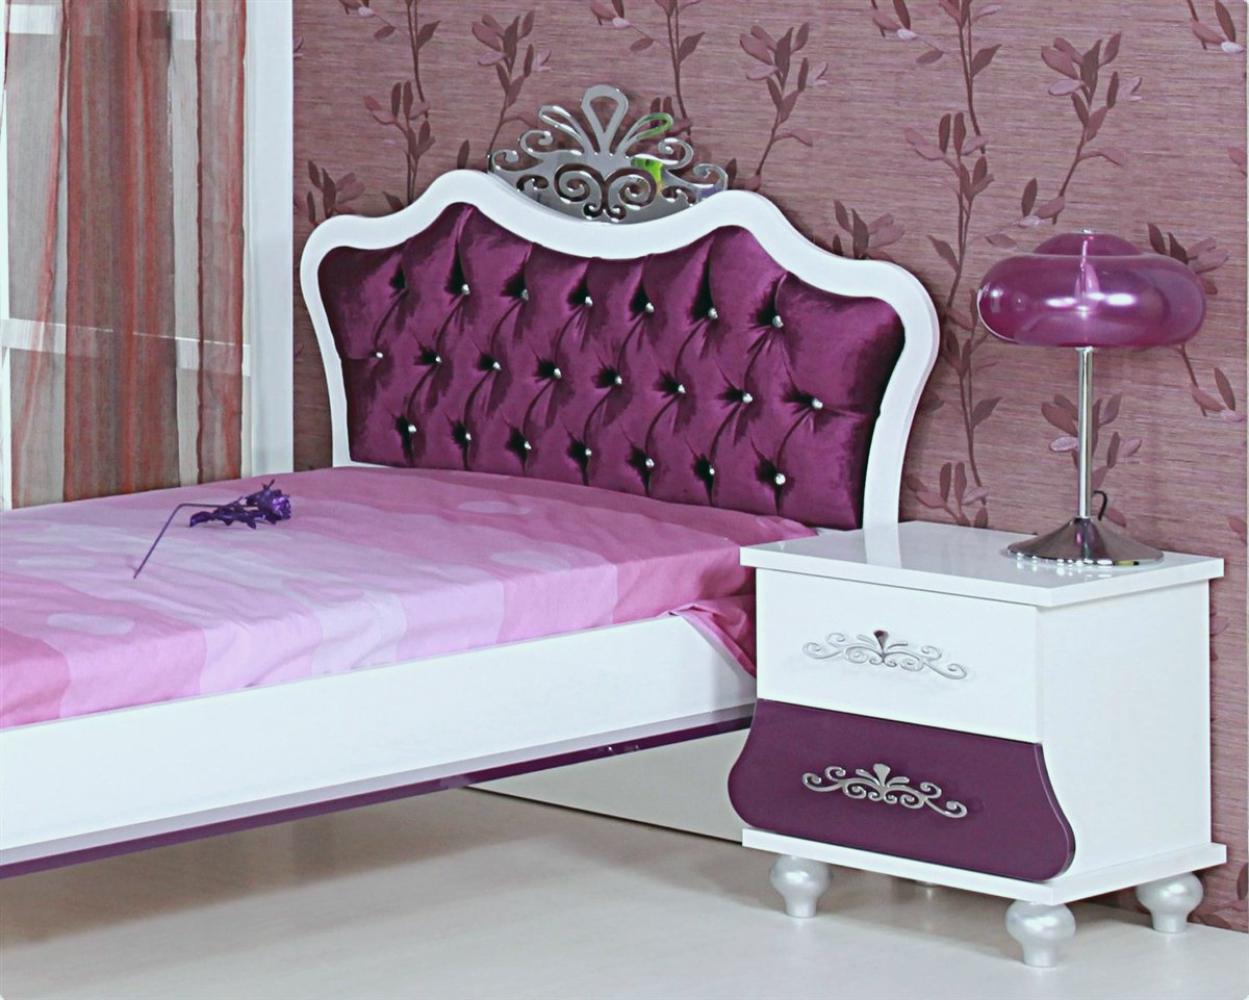 Full Size of Betten Fur Madchen Mädchen Bett Wohnzimmer Kinderbett Mädchen